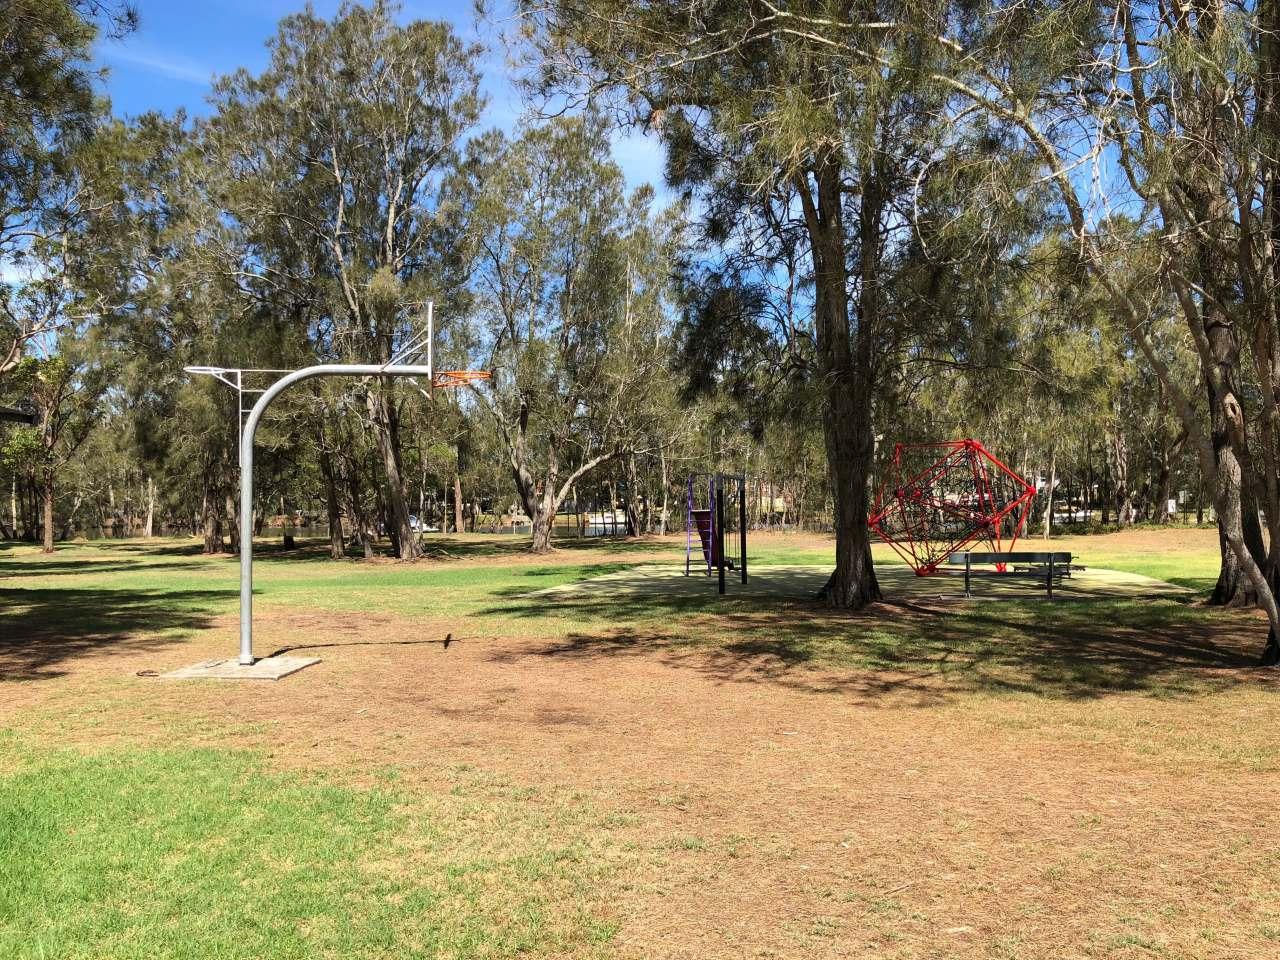 Basketball hoop at Sunshine Reserve, Chittaway